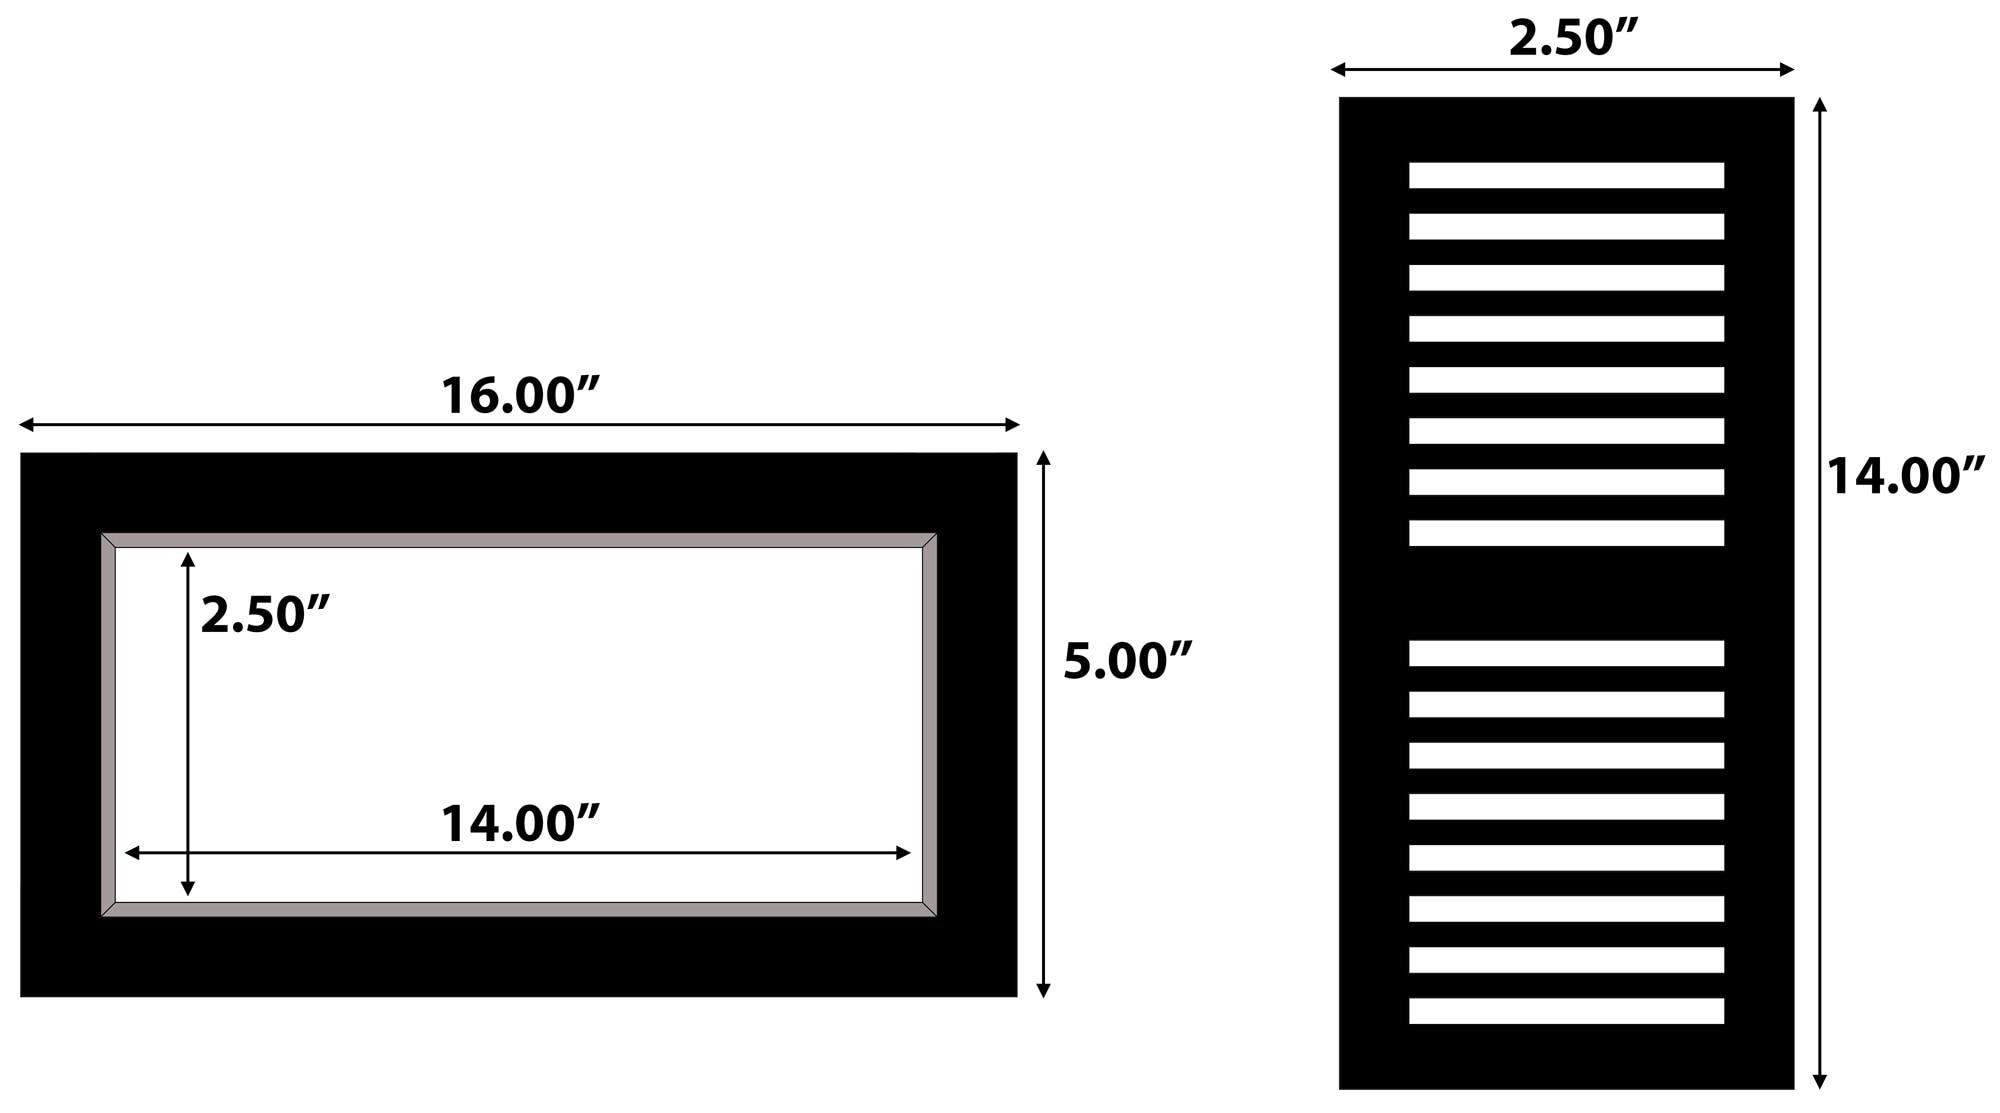 "Light Chestnut / Vent - Flush Mount / 14"" x 2 1/2"" x 1/3"" Maple Character Vents - Ultra Wide - Light Chestnut 0"